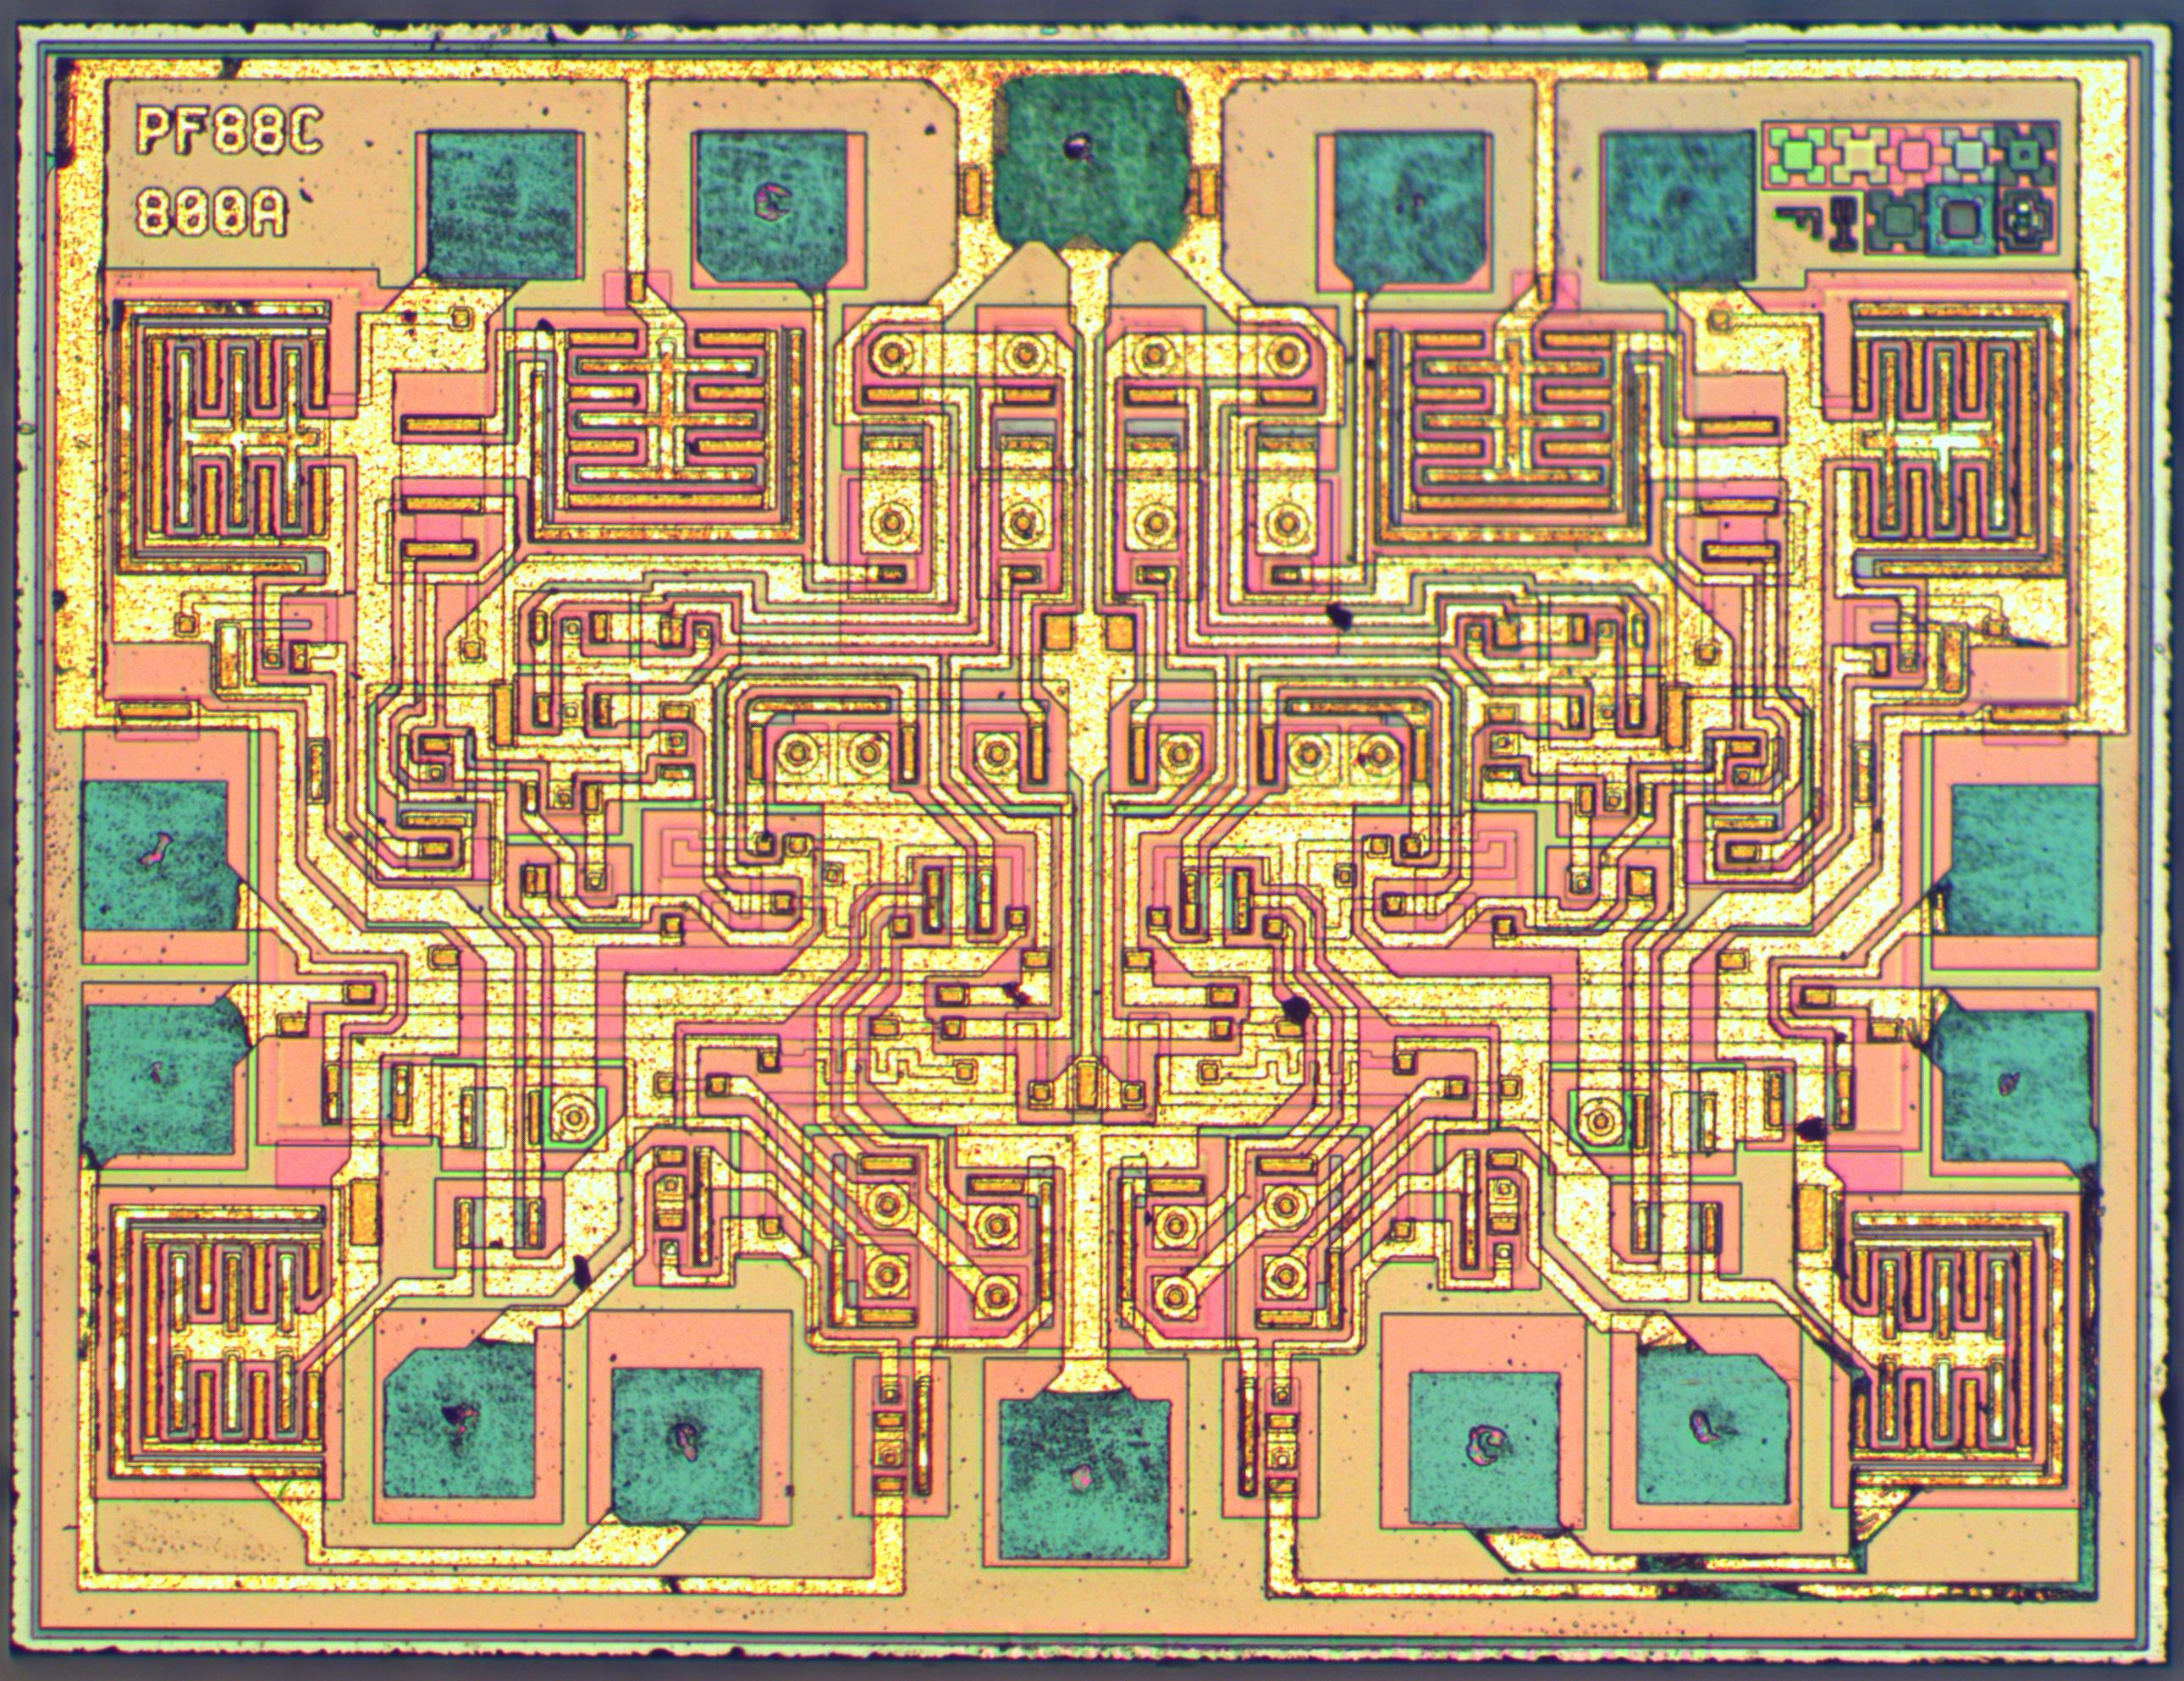 Zeptobars Diagram Circuit March 2013